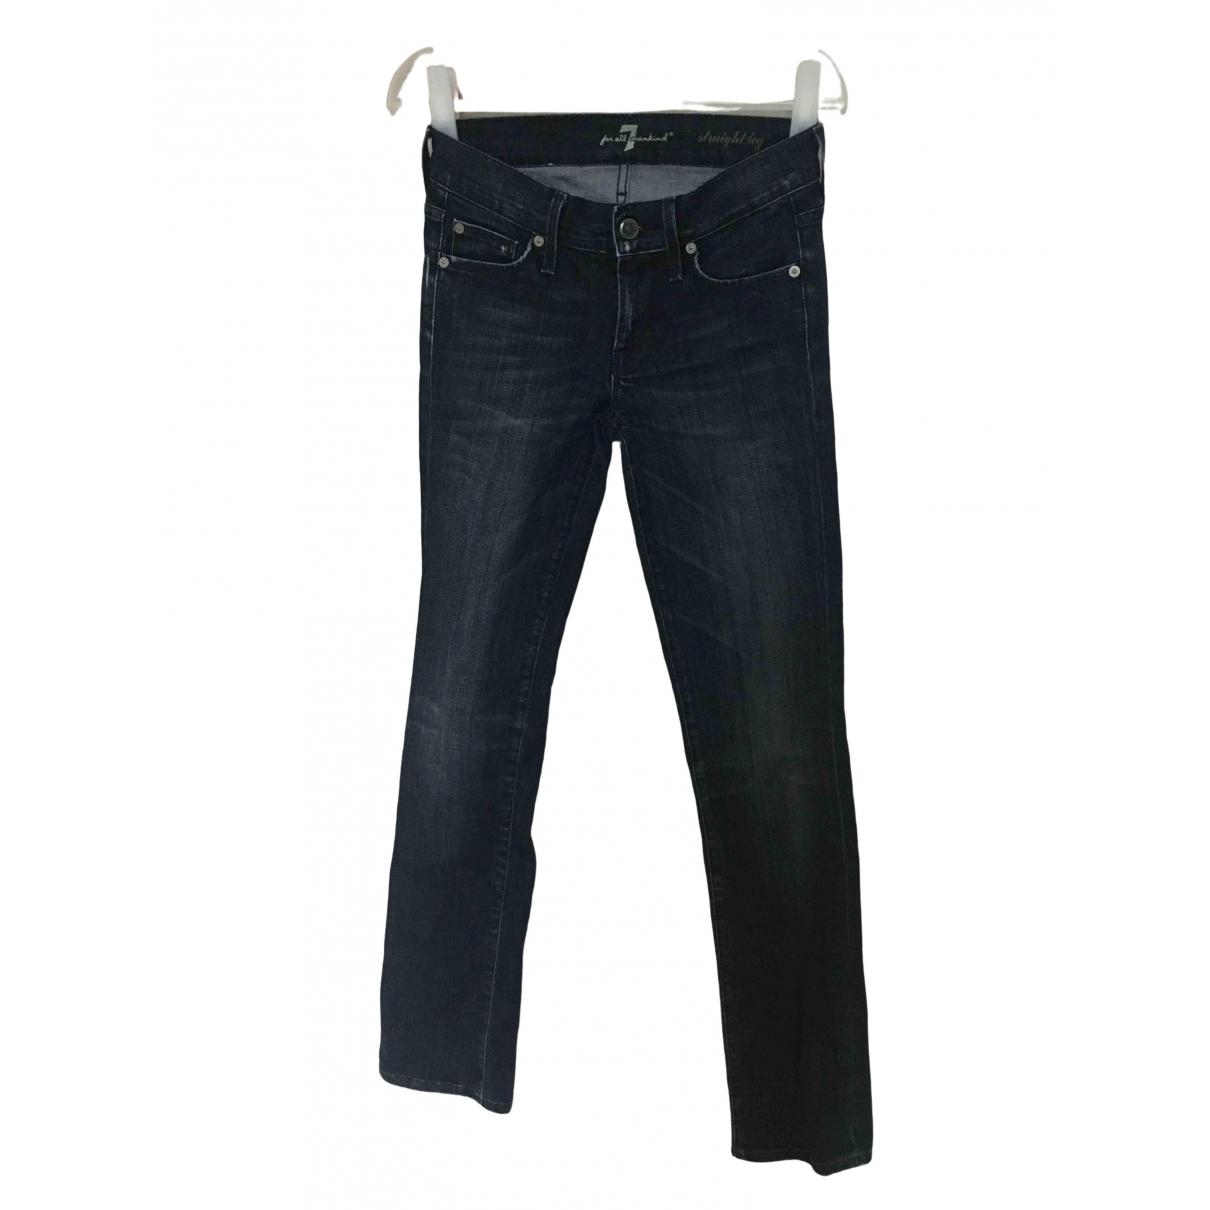 7 For All Mankind - Jean   pour femme en coton - elasthane - bleu